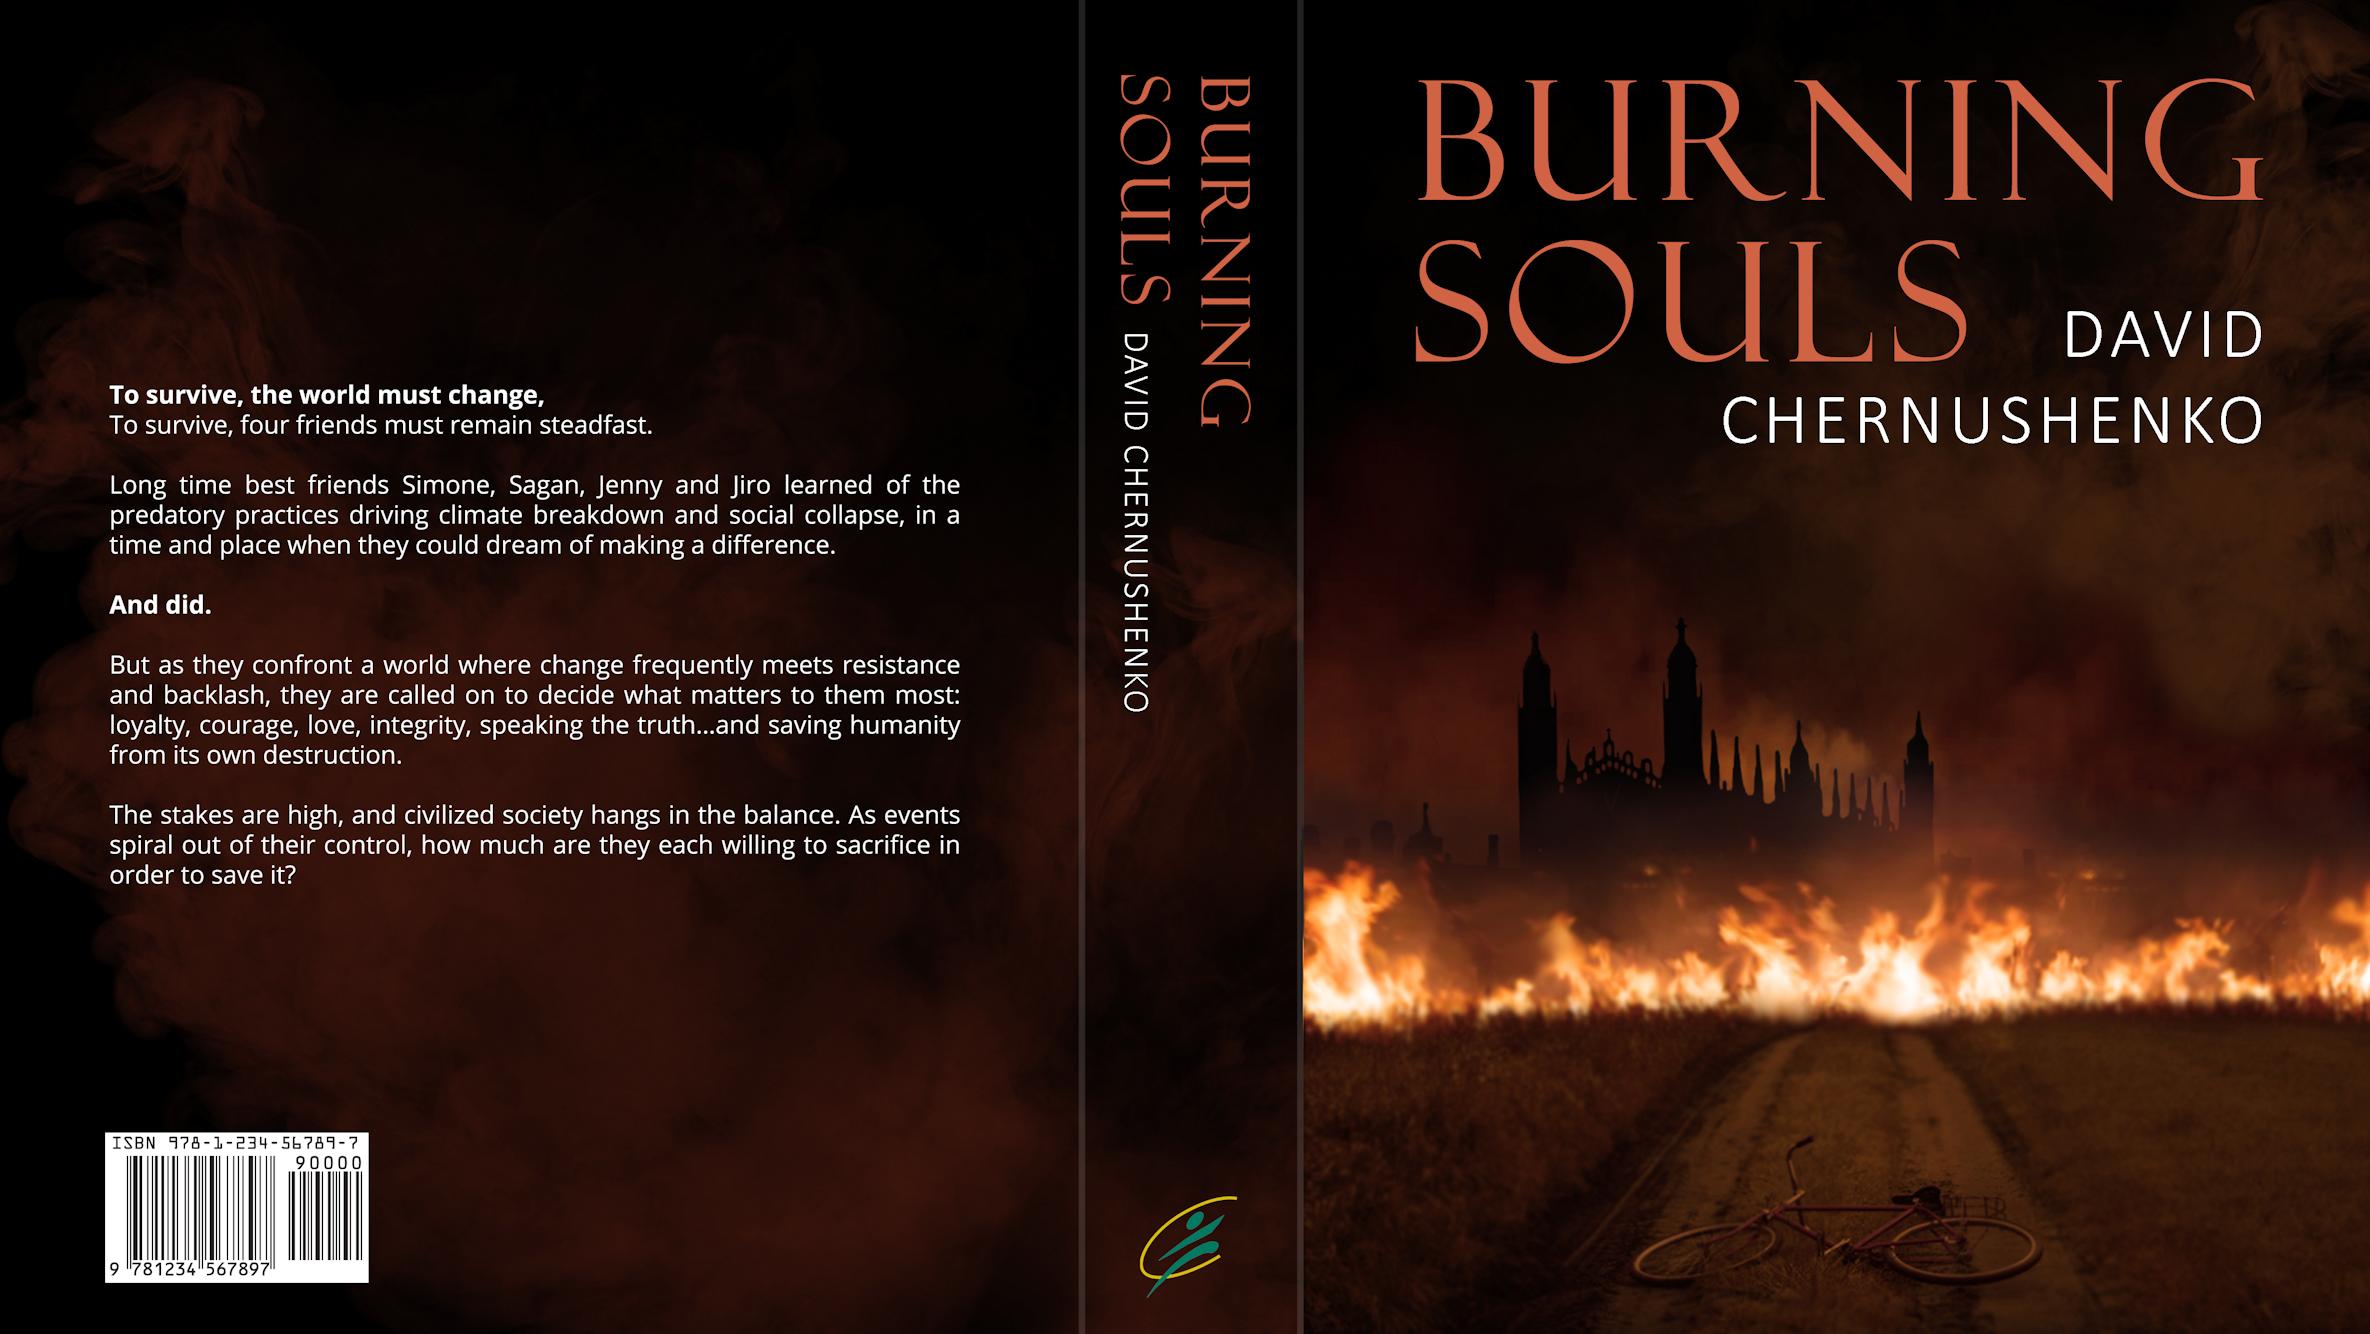 Burning Souls Book Cover 2019 David Chernushenko